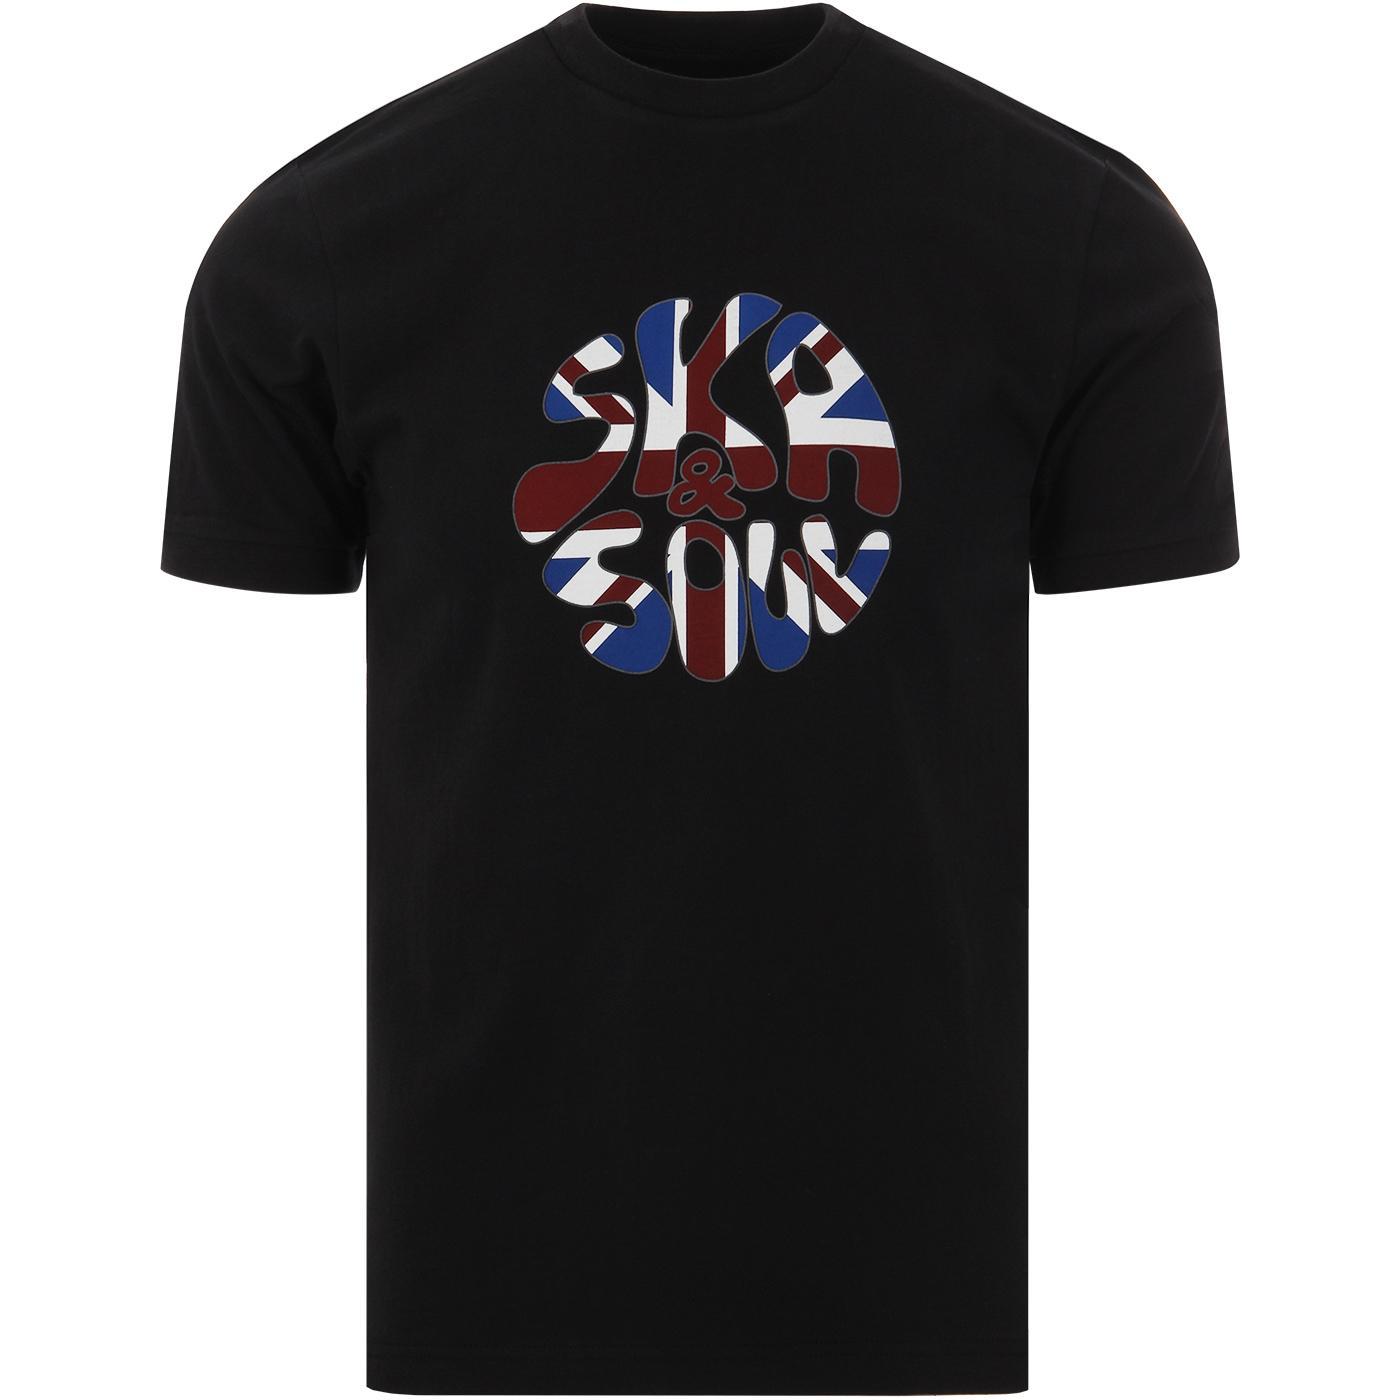 SKA & SOUL Men's Retro Union Jack Flag Logo Tee